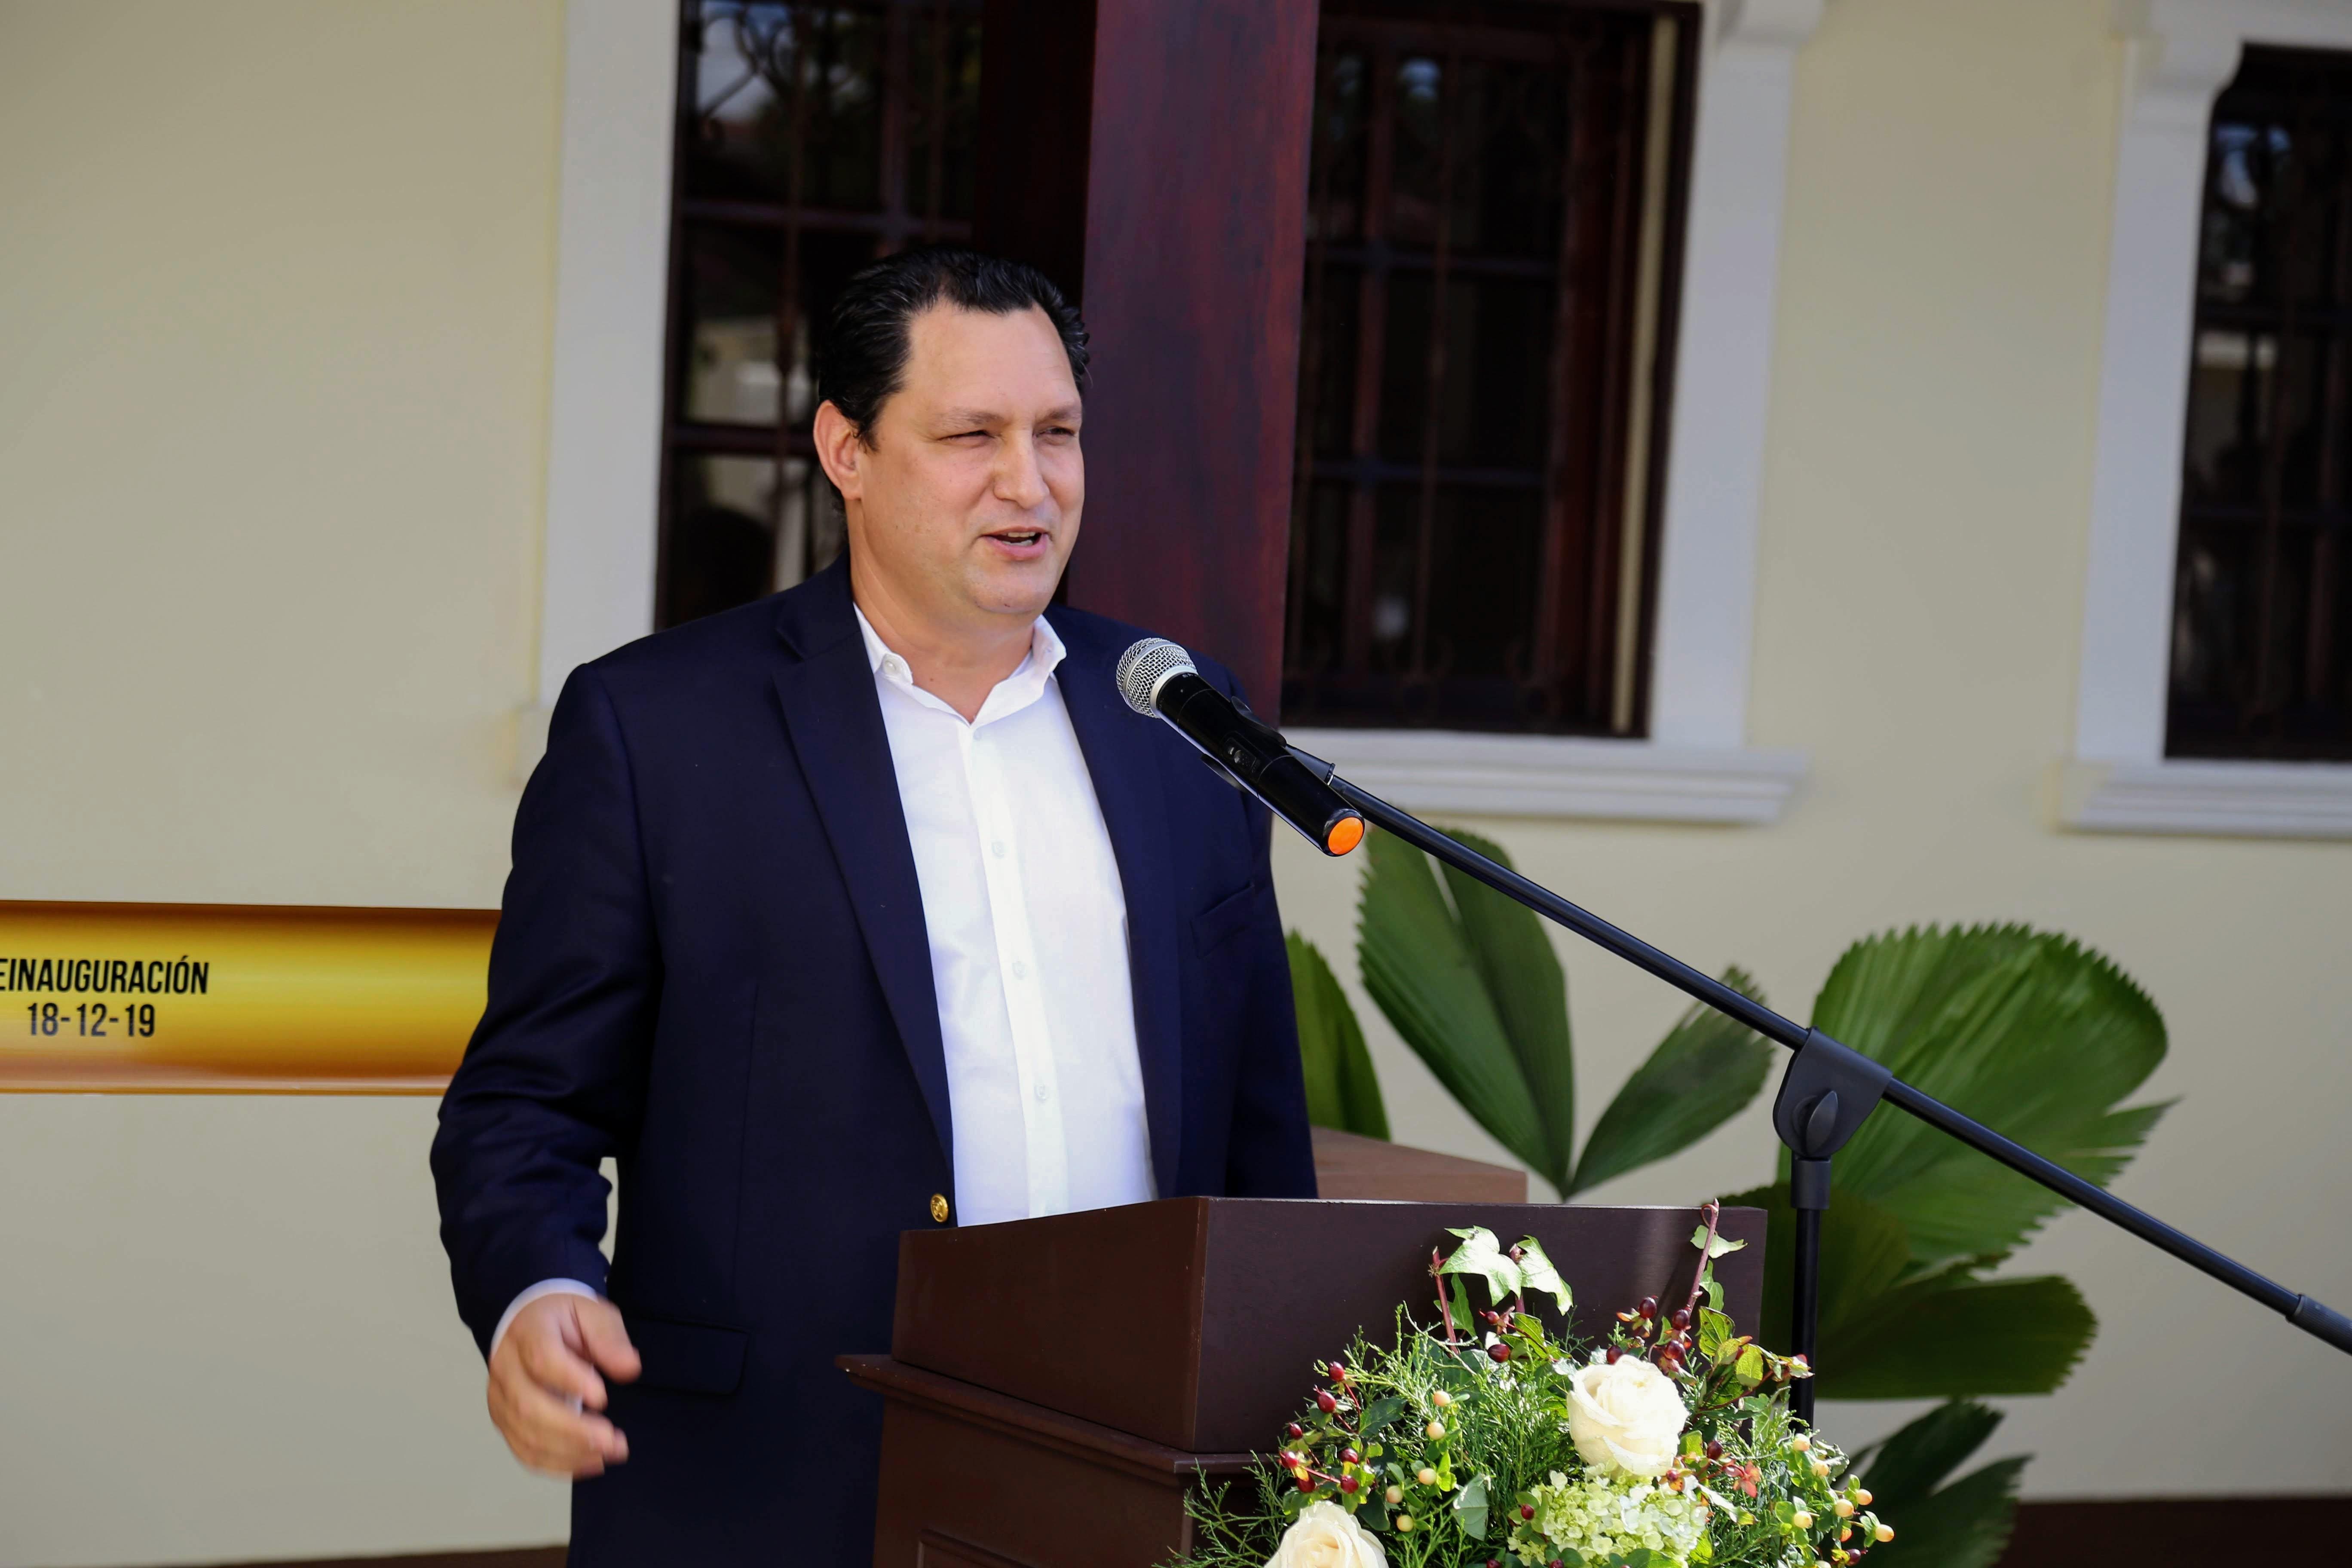 Fidel Valdés Rodríguez